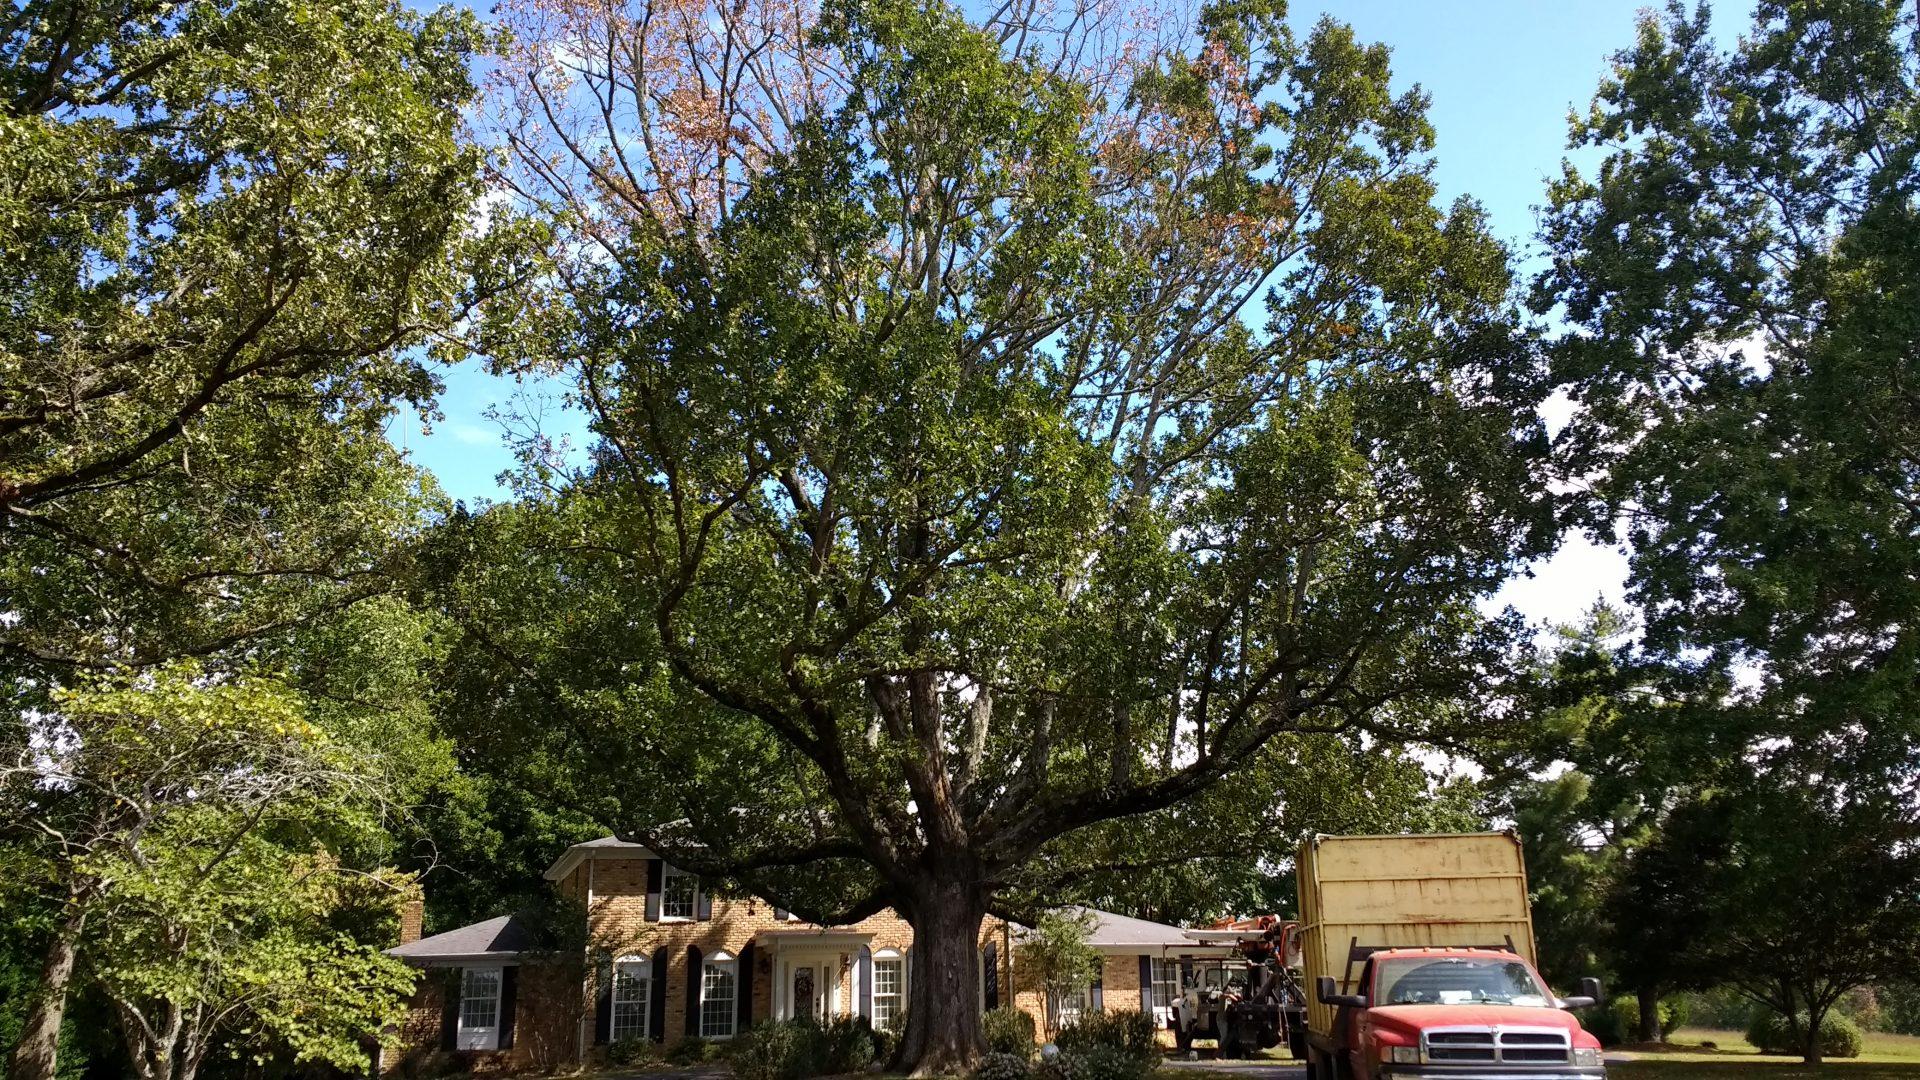 tree trimming, limb removal, tree near house